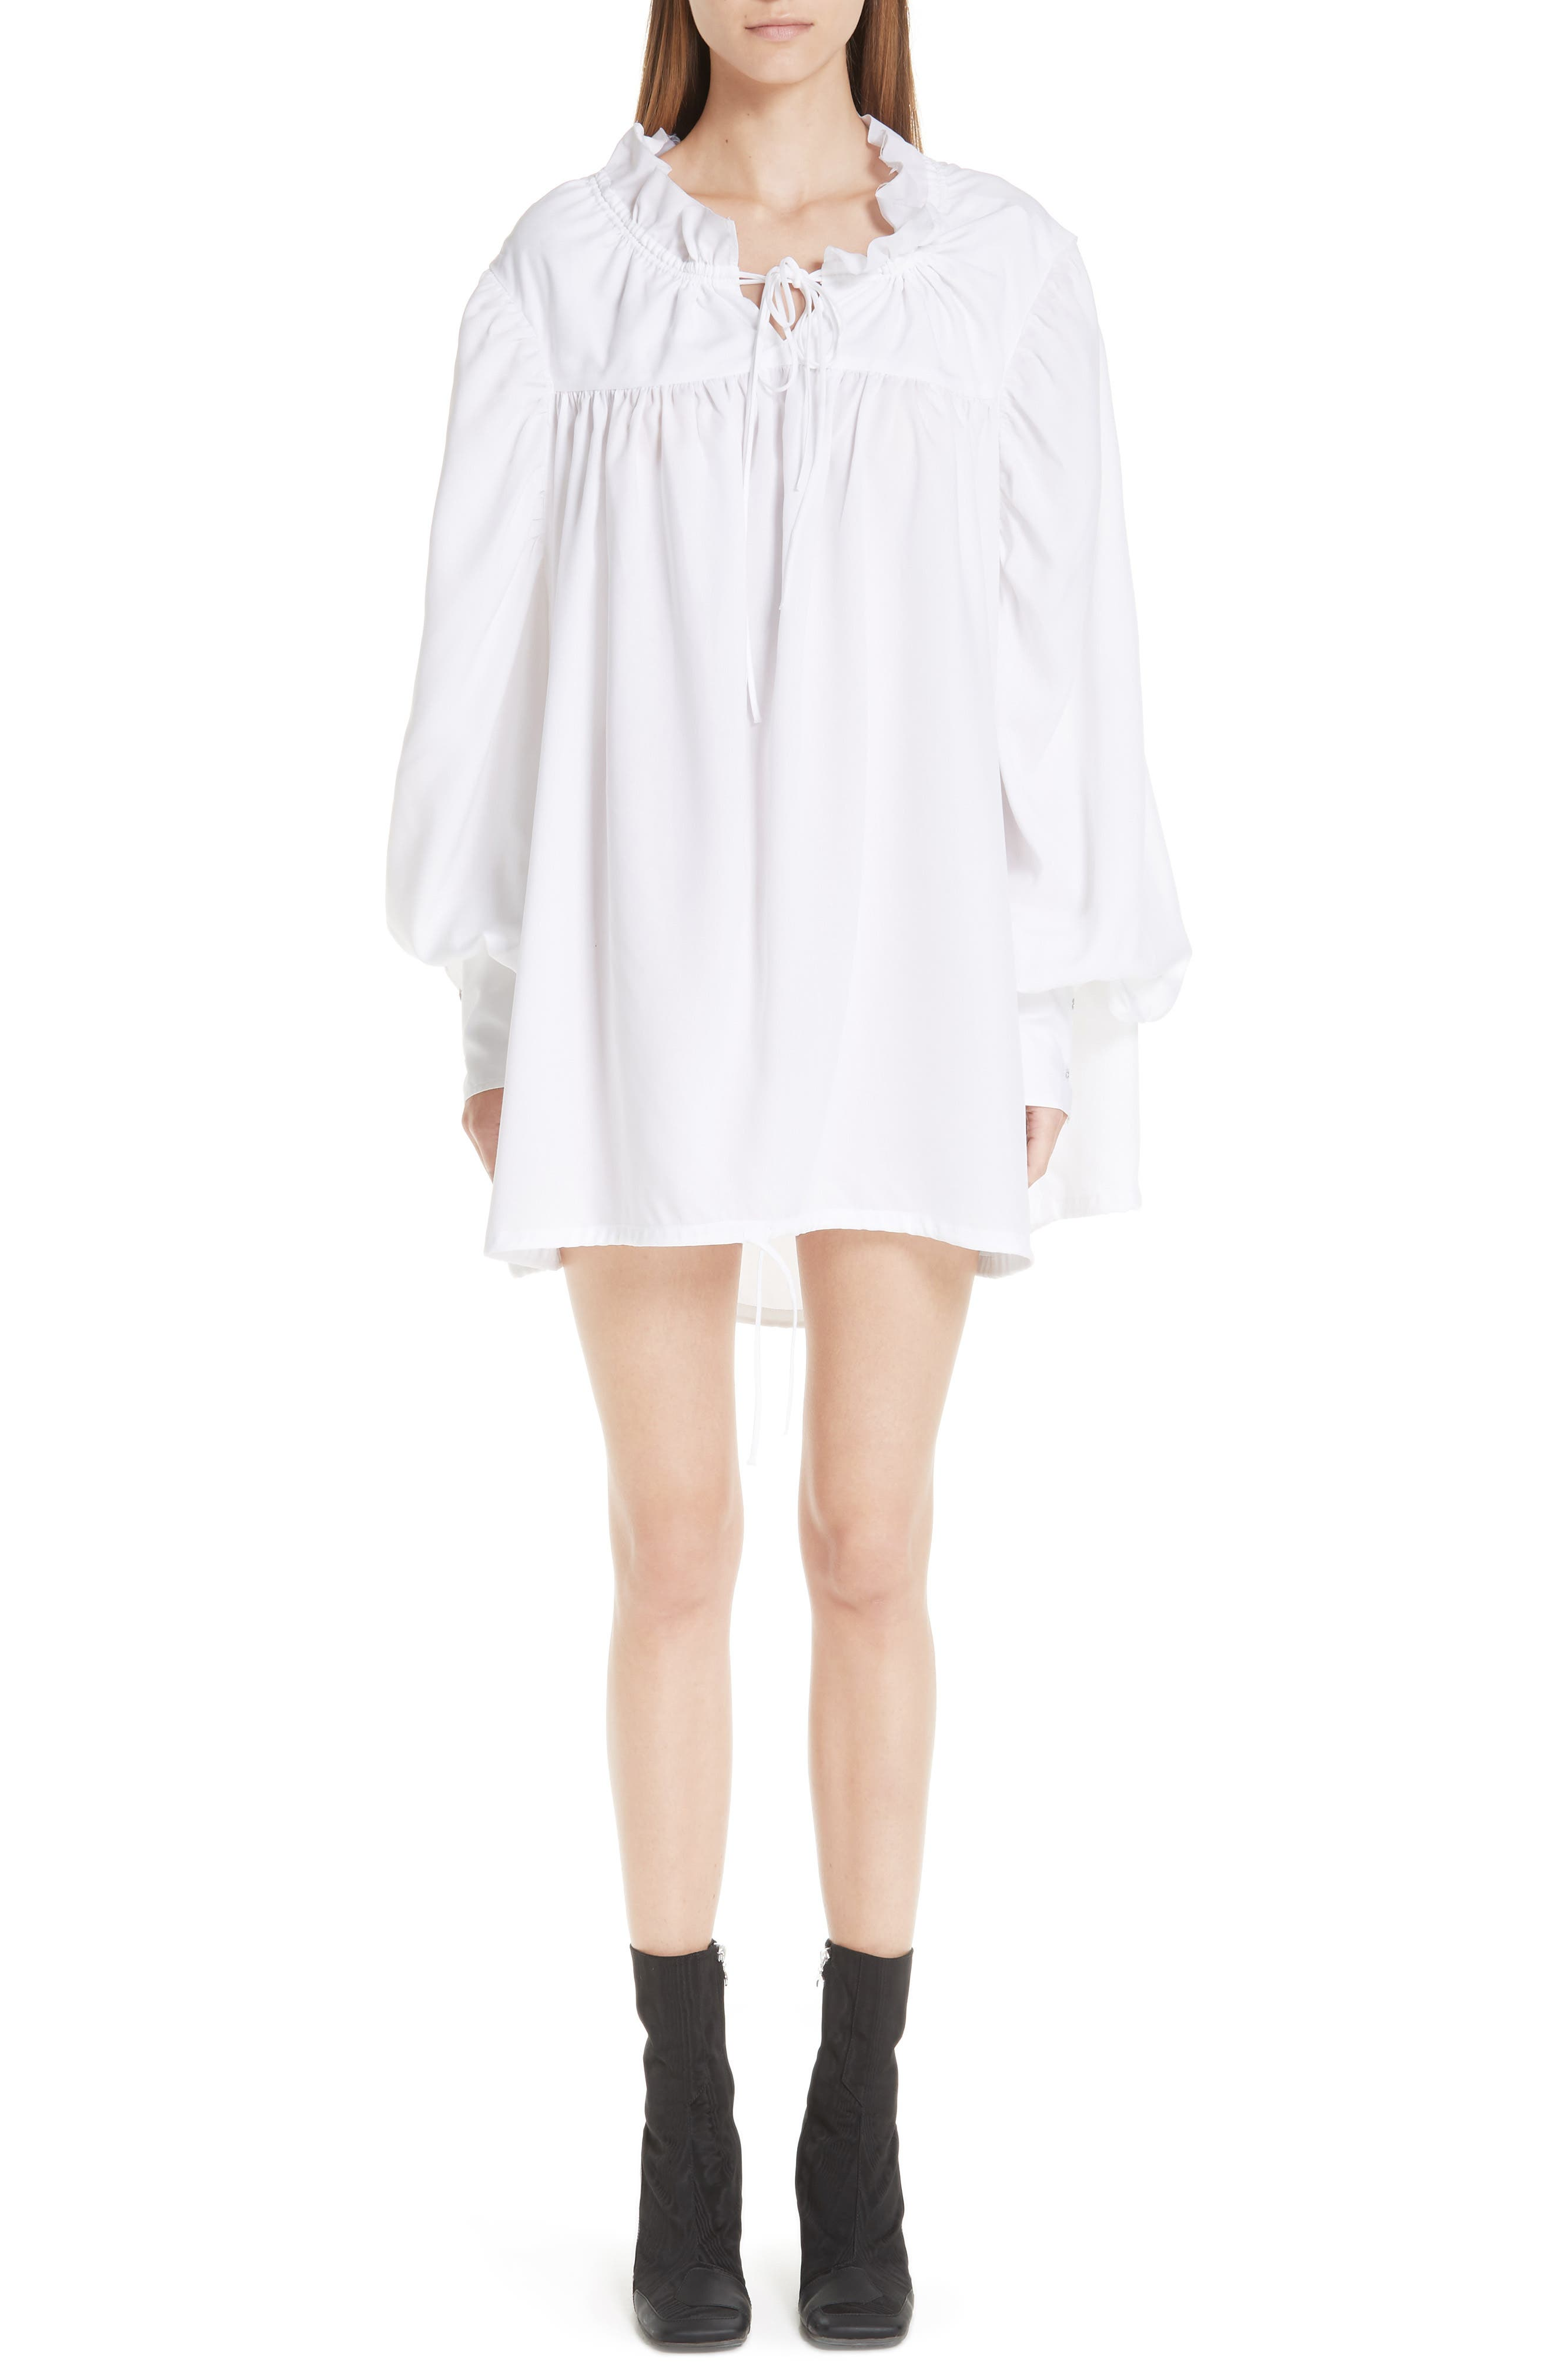 Marques'Almeida Gathered Yoke Shirt,                         Main,                         color, WHITE